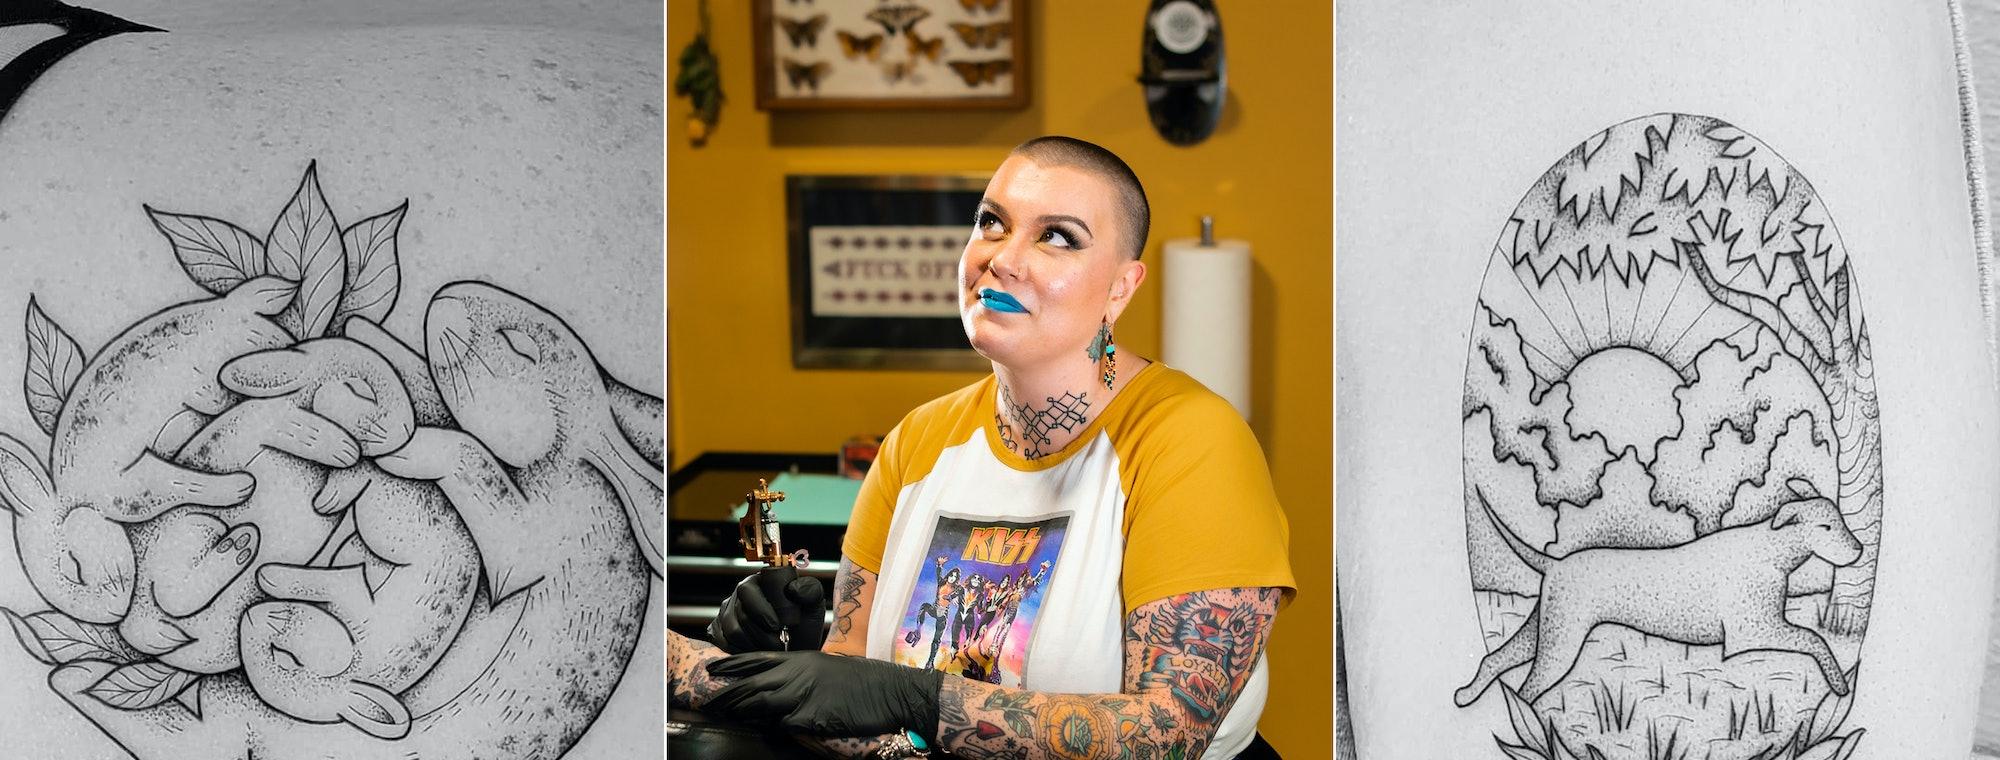 Ann Arbor Based Tattoo Artist Carrie Metz Caporussos Black